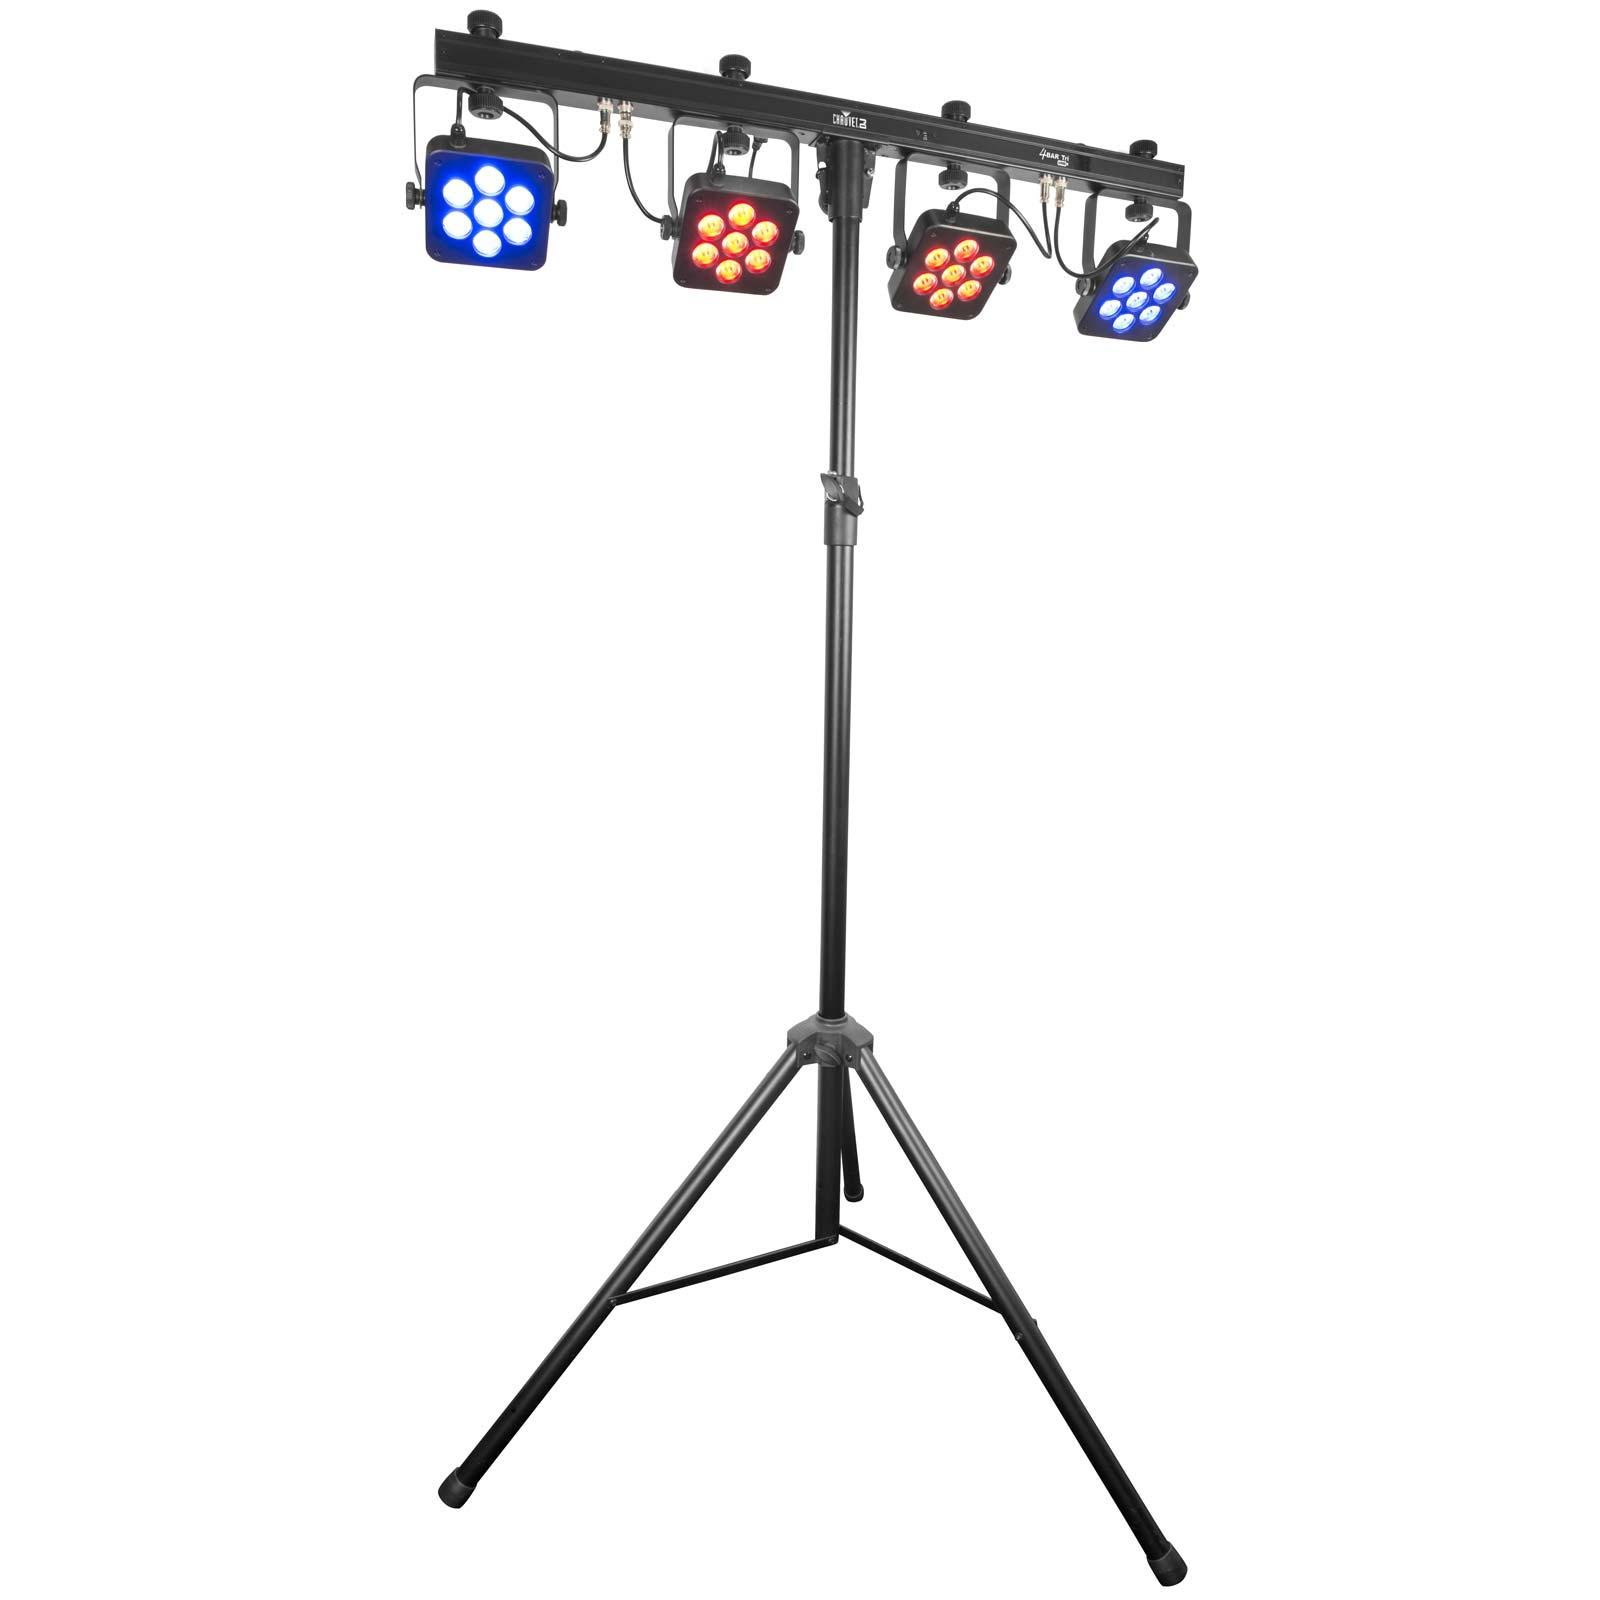 Chauvet 4BAR Tri USB Wash Lighting System